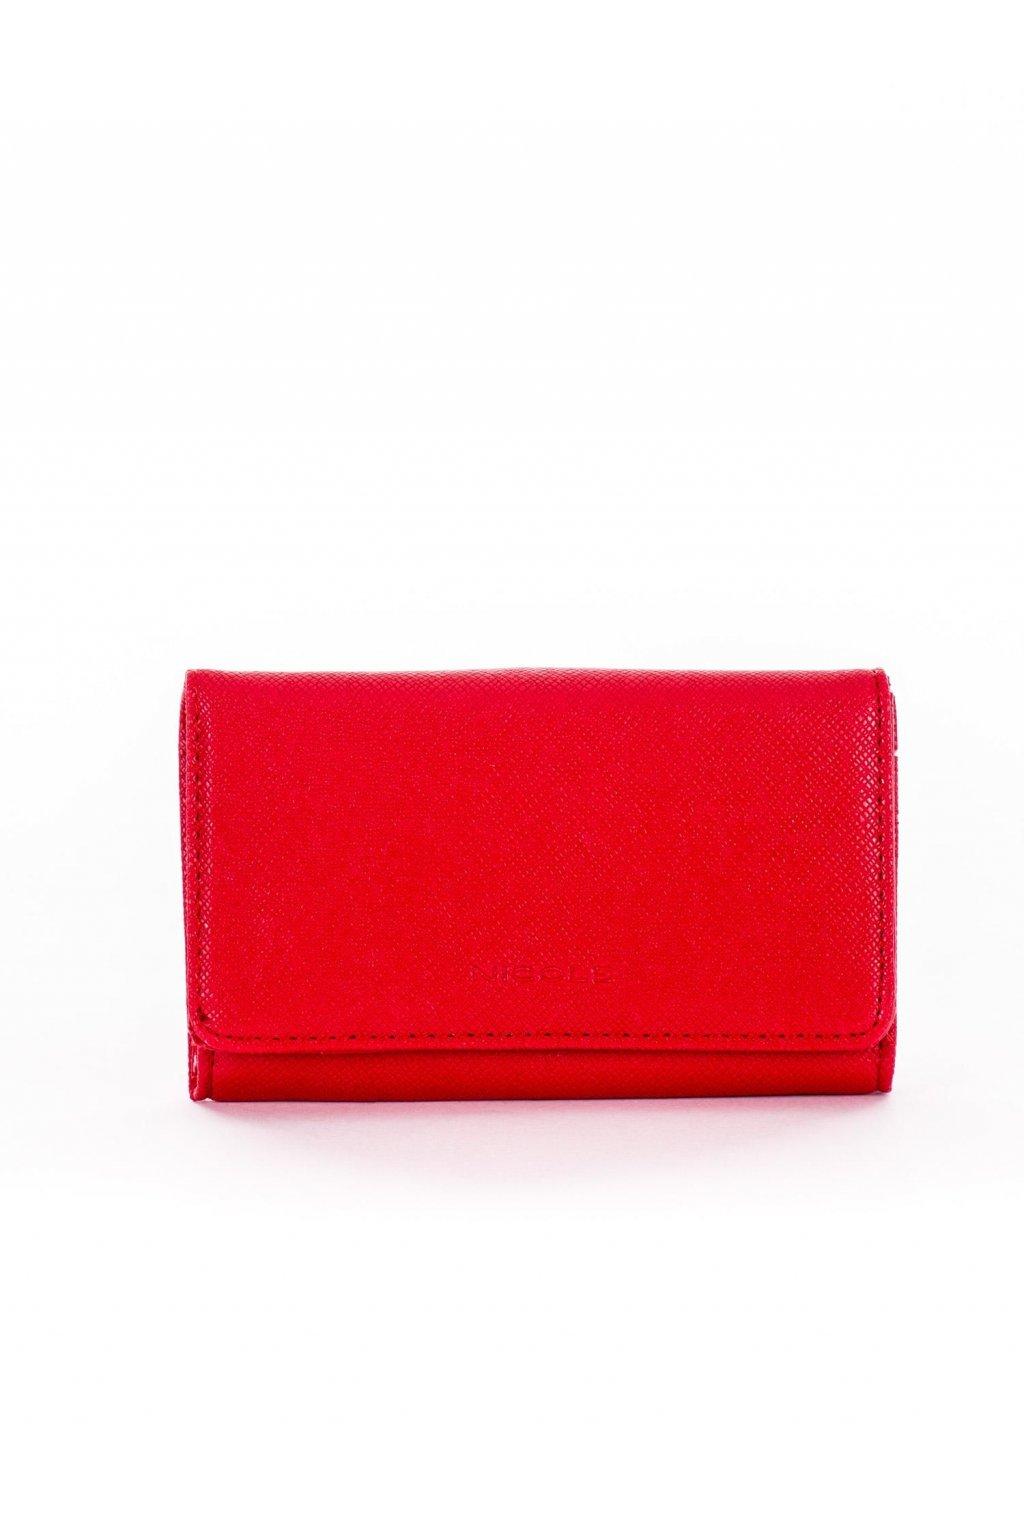 Peňaženka kód G104-1627